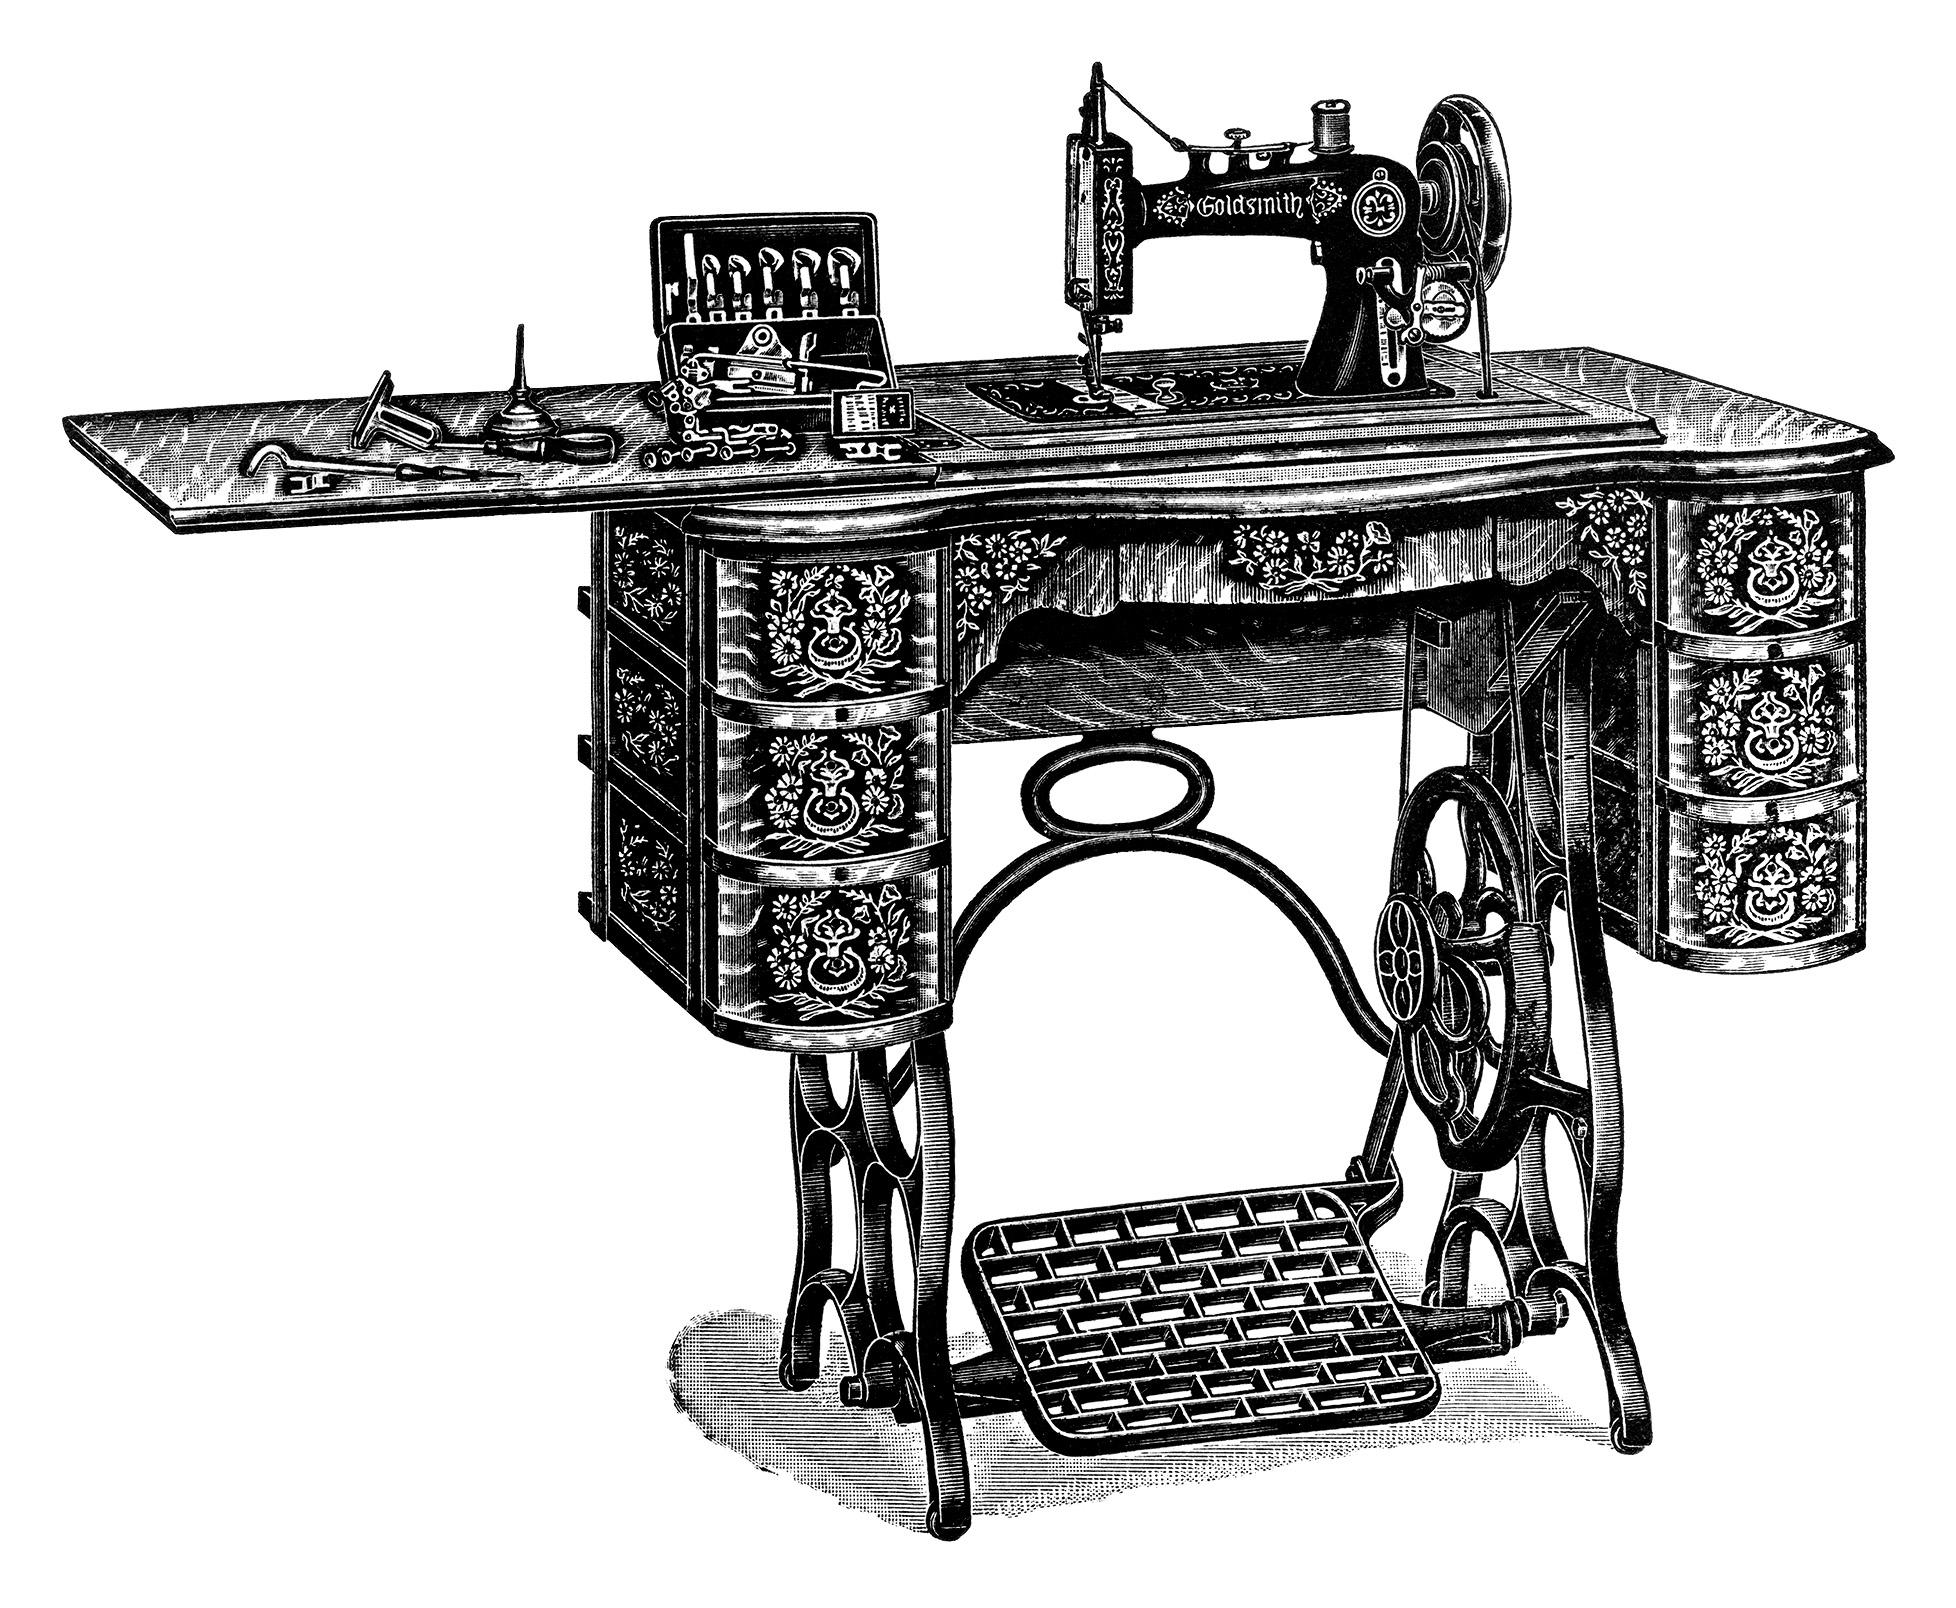 free vintage treadle sewing machine images catalogue page and clip art old design shop blog. Black Bedroom Furniture Sets. Home Design Ideas